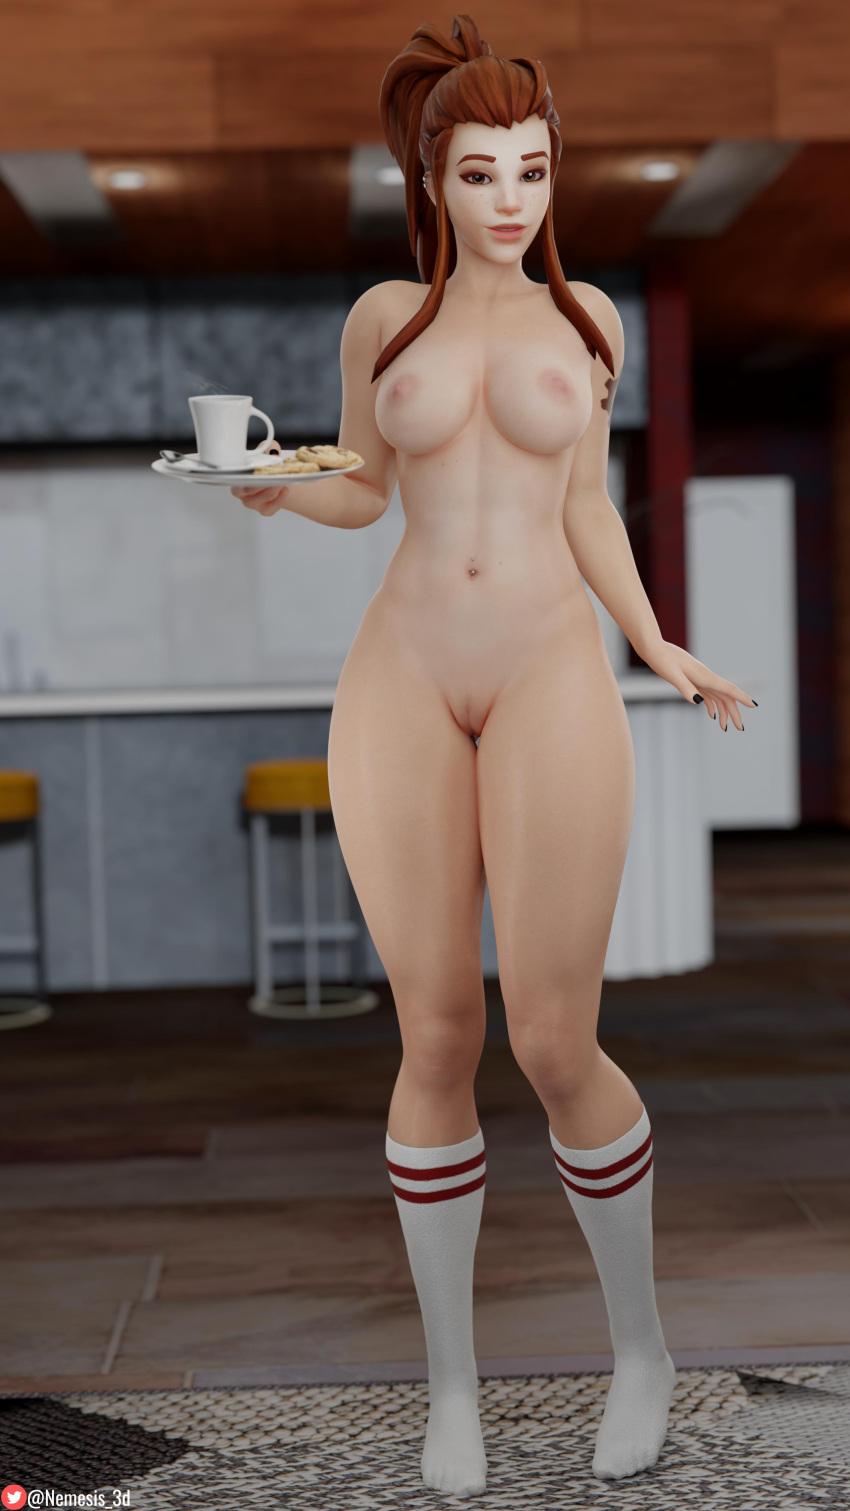 Overwatch brigitte nude